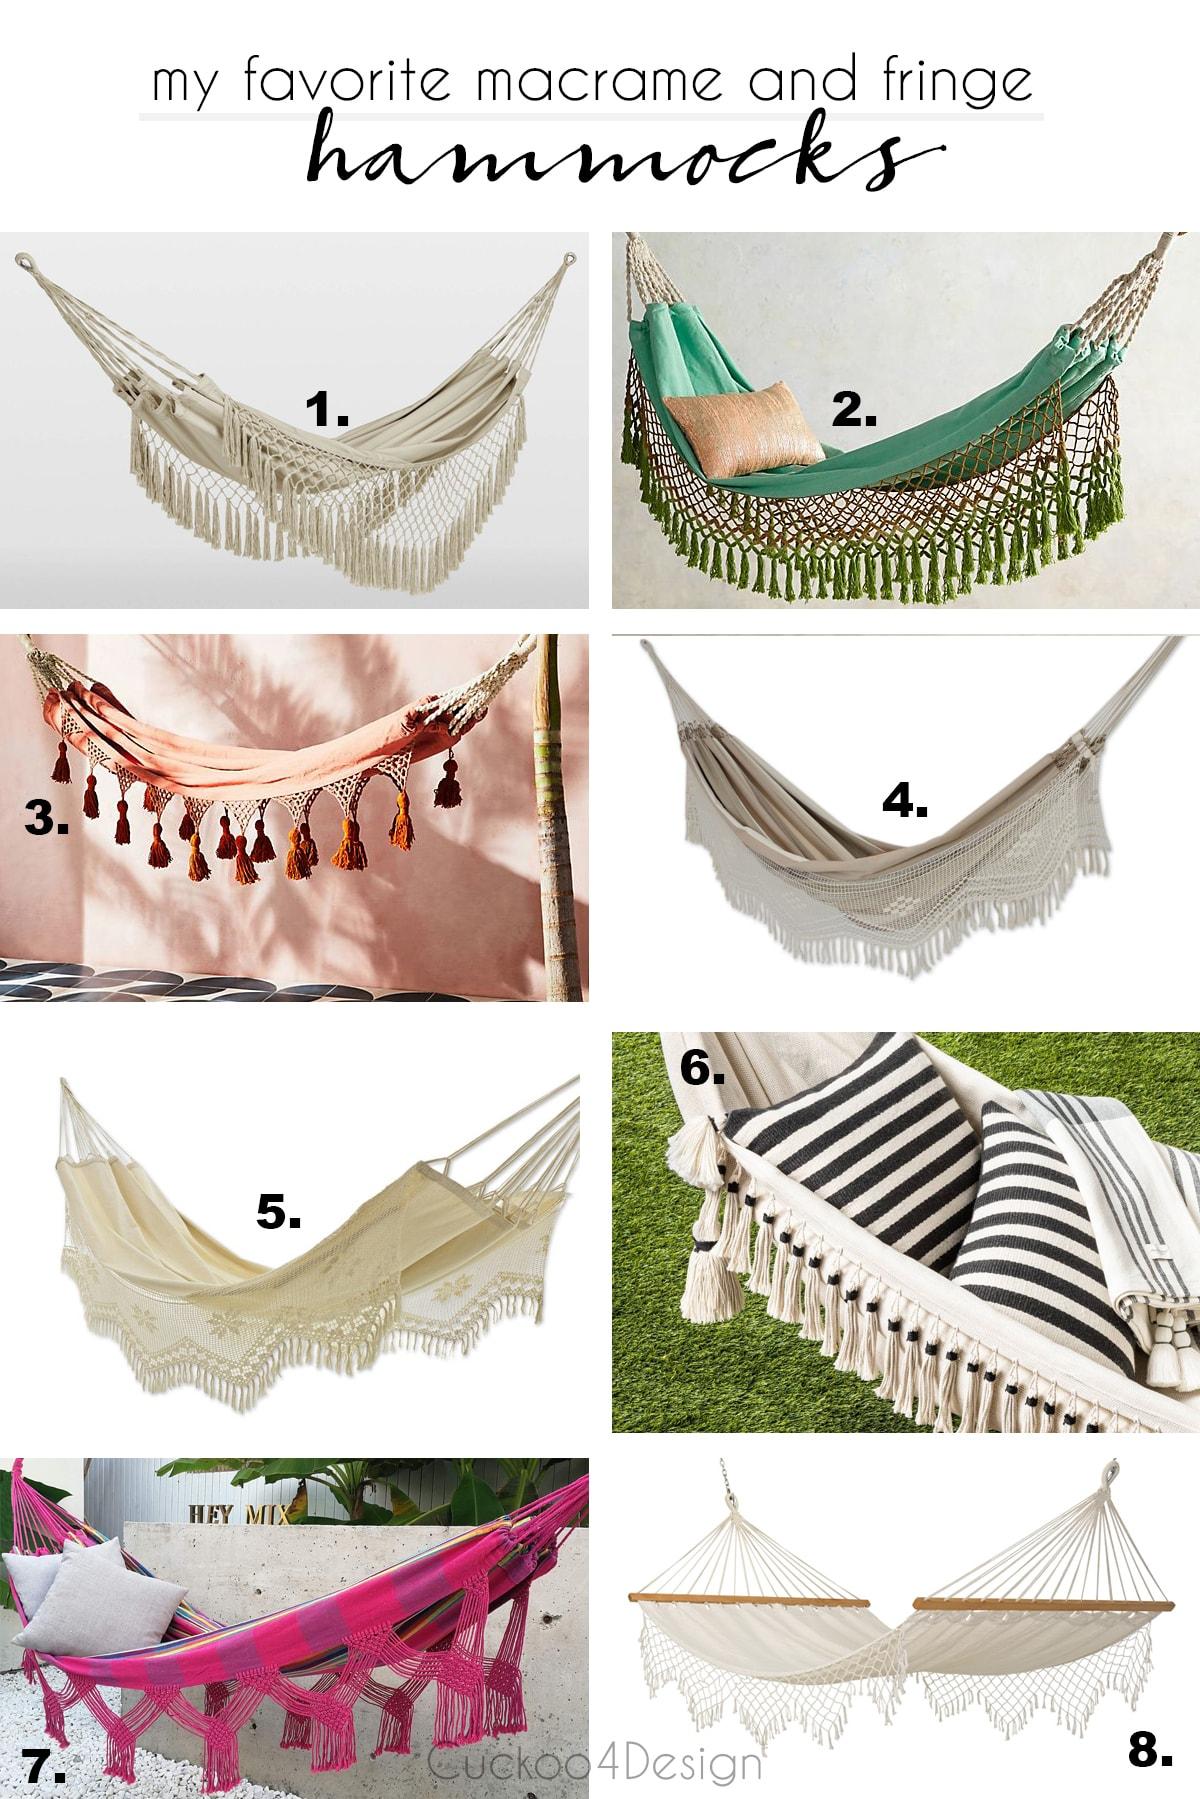 my favorite macrame and fringe hammocks